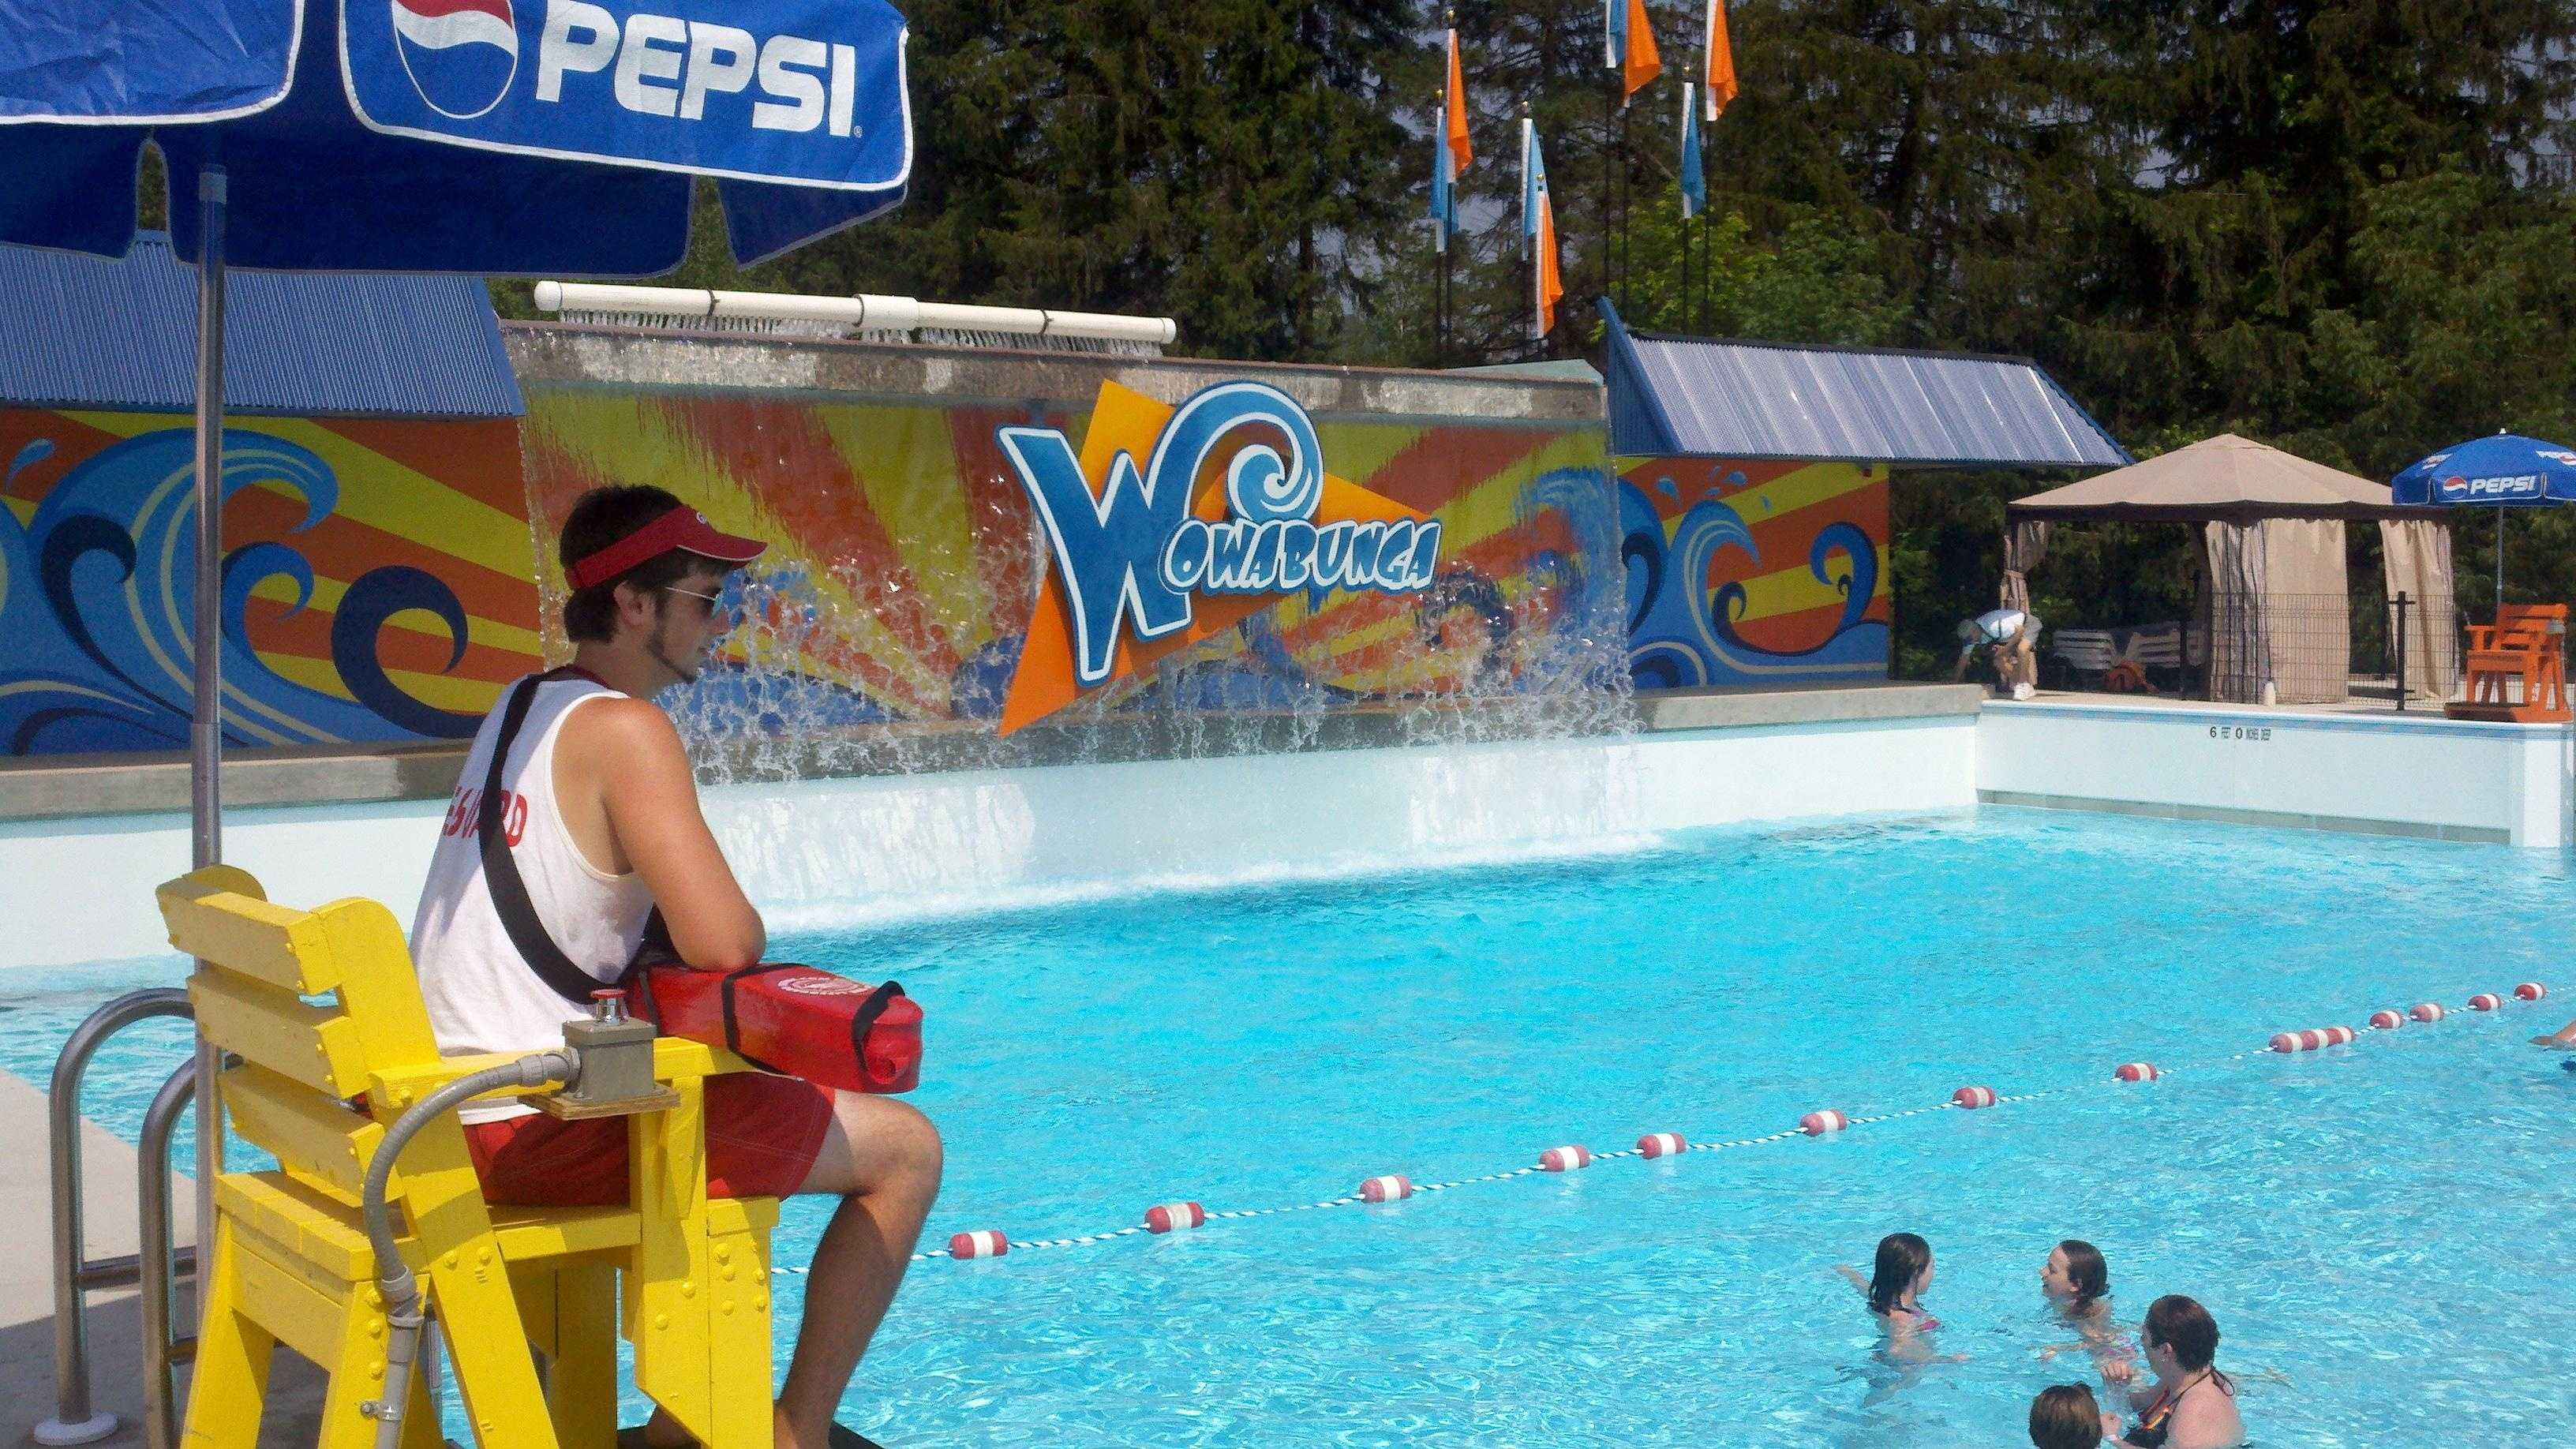 Idlewild Ligonier Wowabunga Wave Pool #1 (2011-06-08-11-16-26-622.jpg) - 28170116